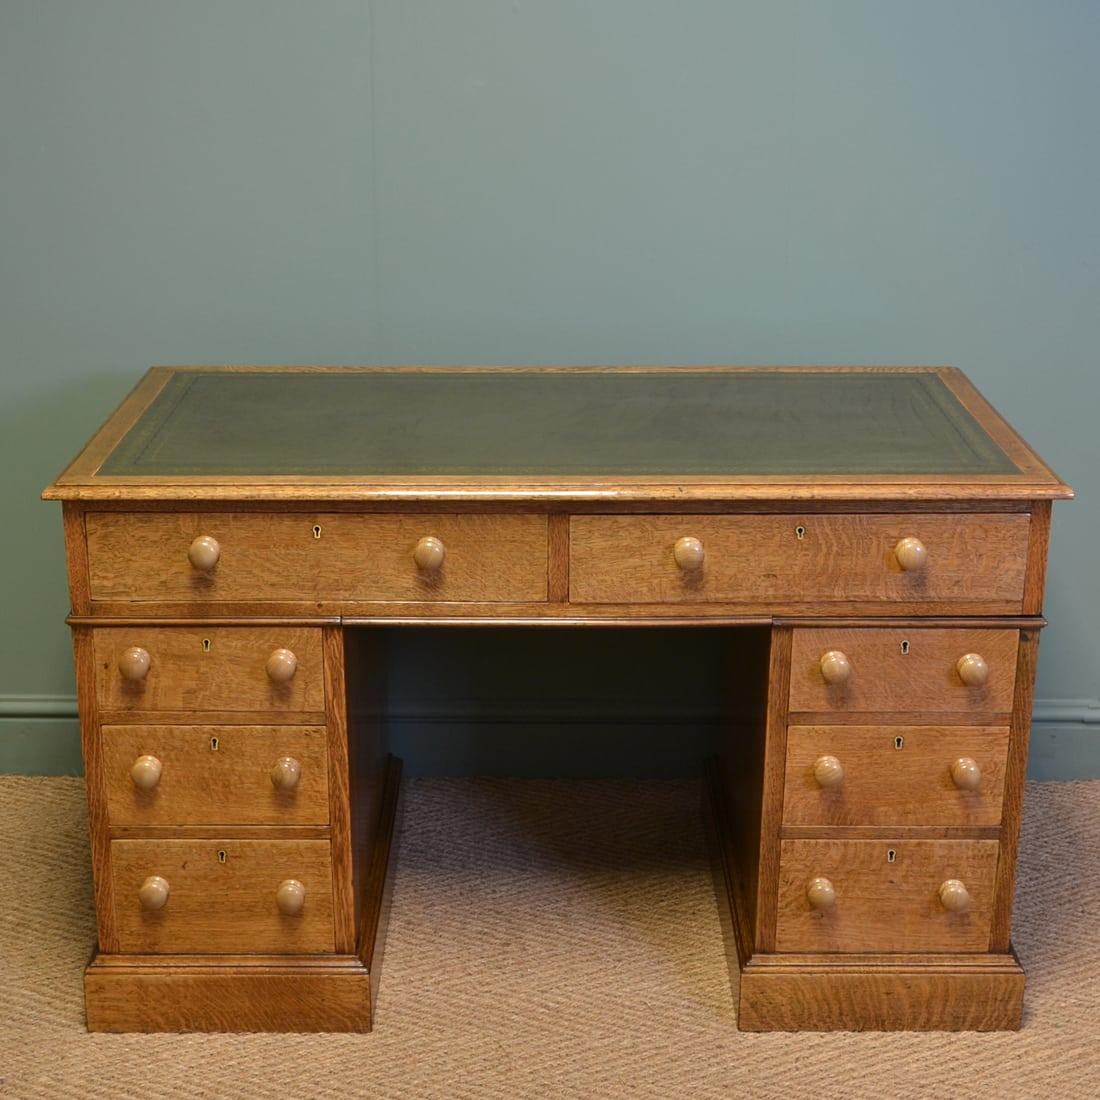 Antique Edwardian Desks